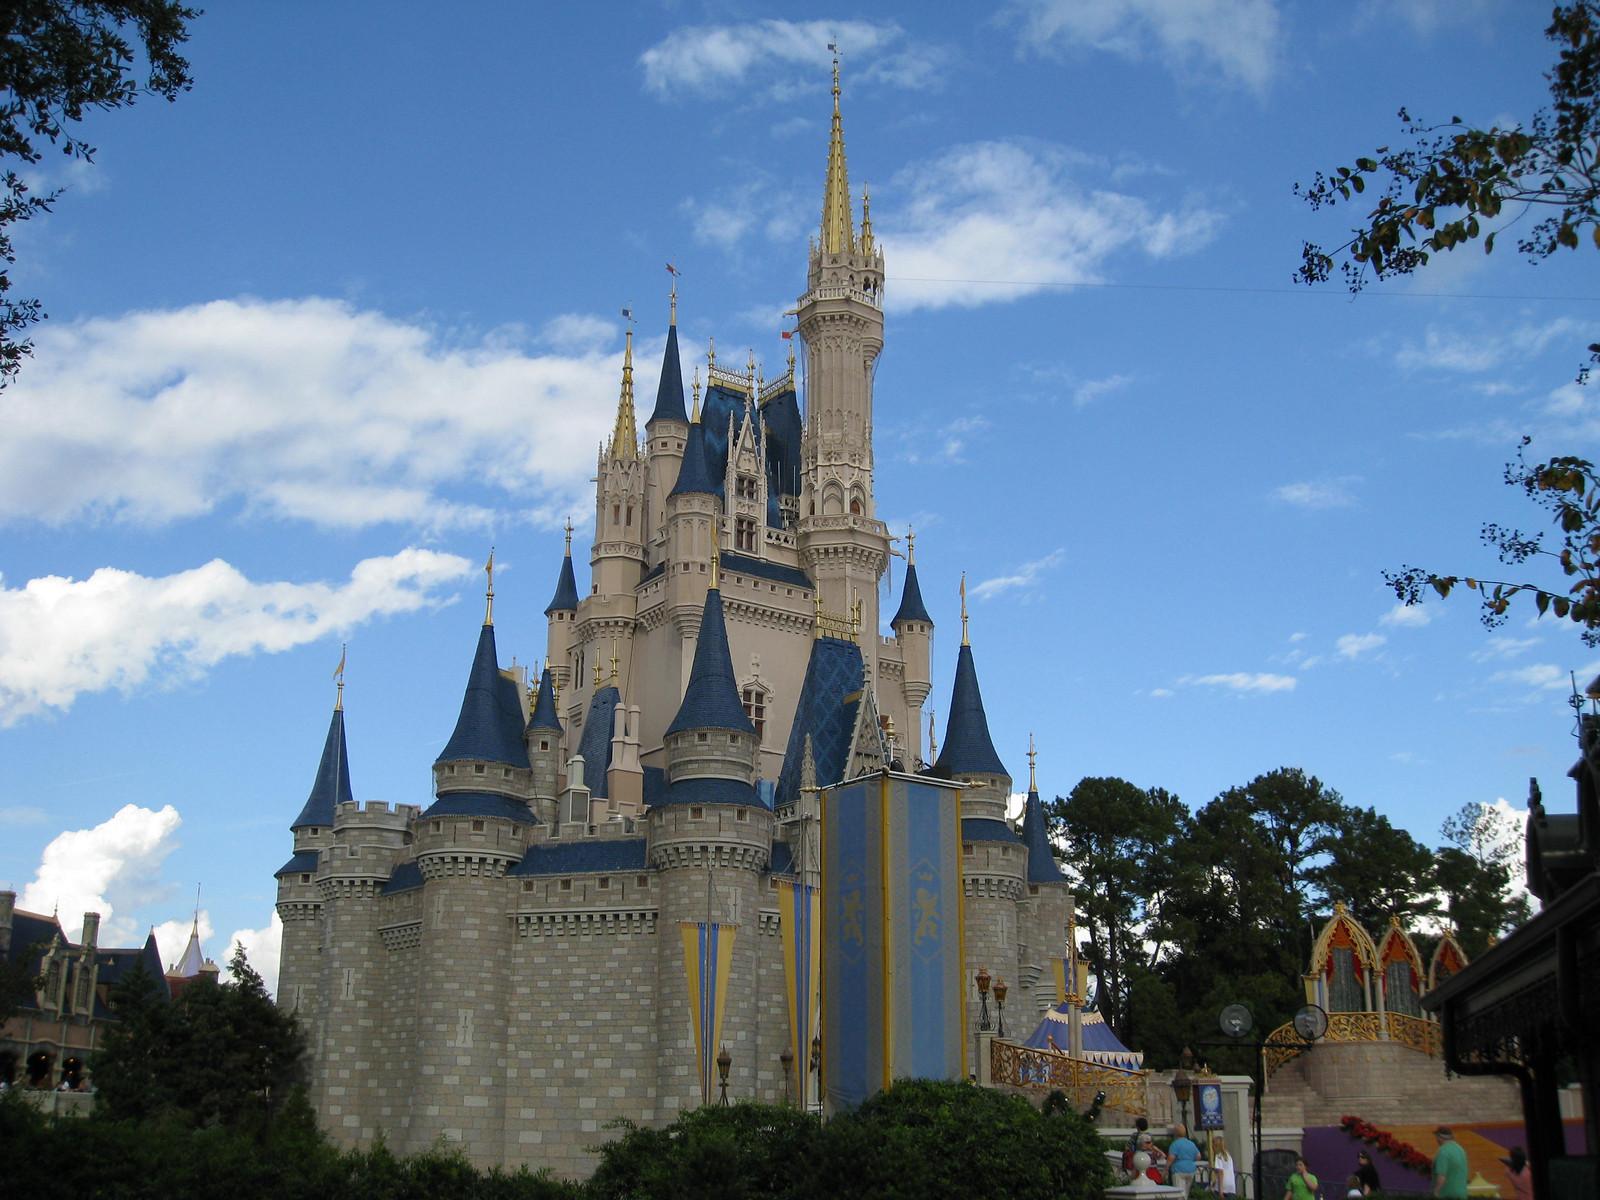 http://1.bp.blogspot.com/-qM6YuQPwF0g/TbVgBJdZy1I/AAAAAAAADbc/mu1K68YE0Os/s1600/disney-castle_3_1600_x_1200.jpg